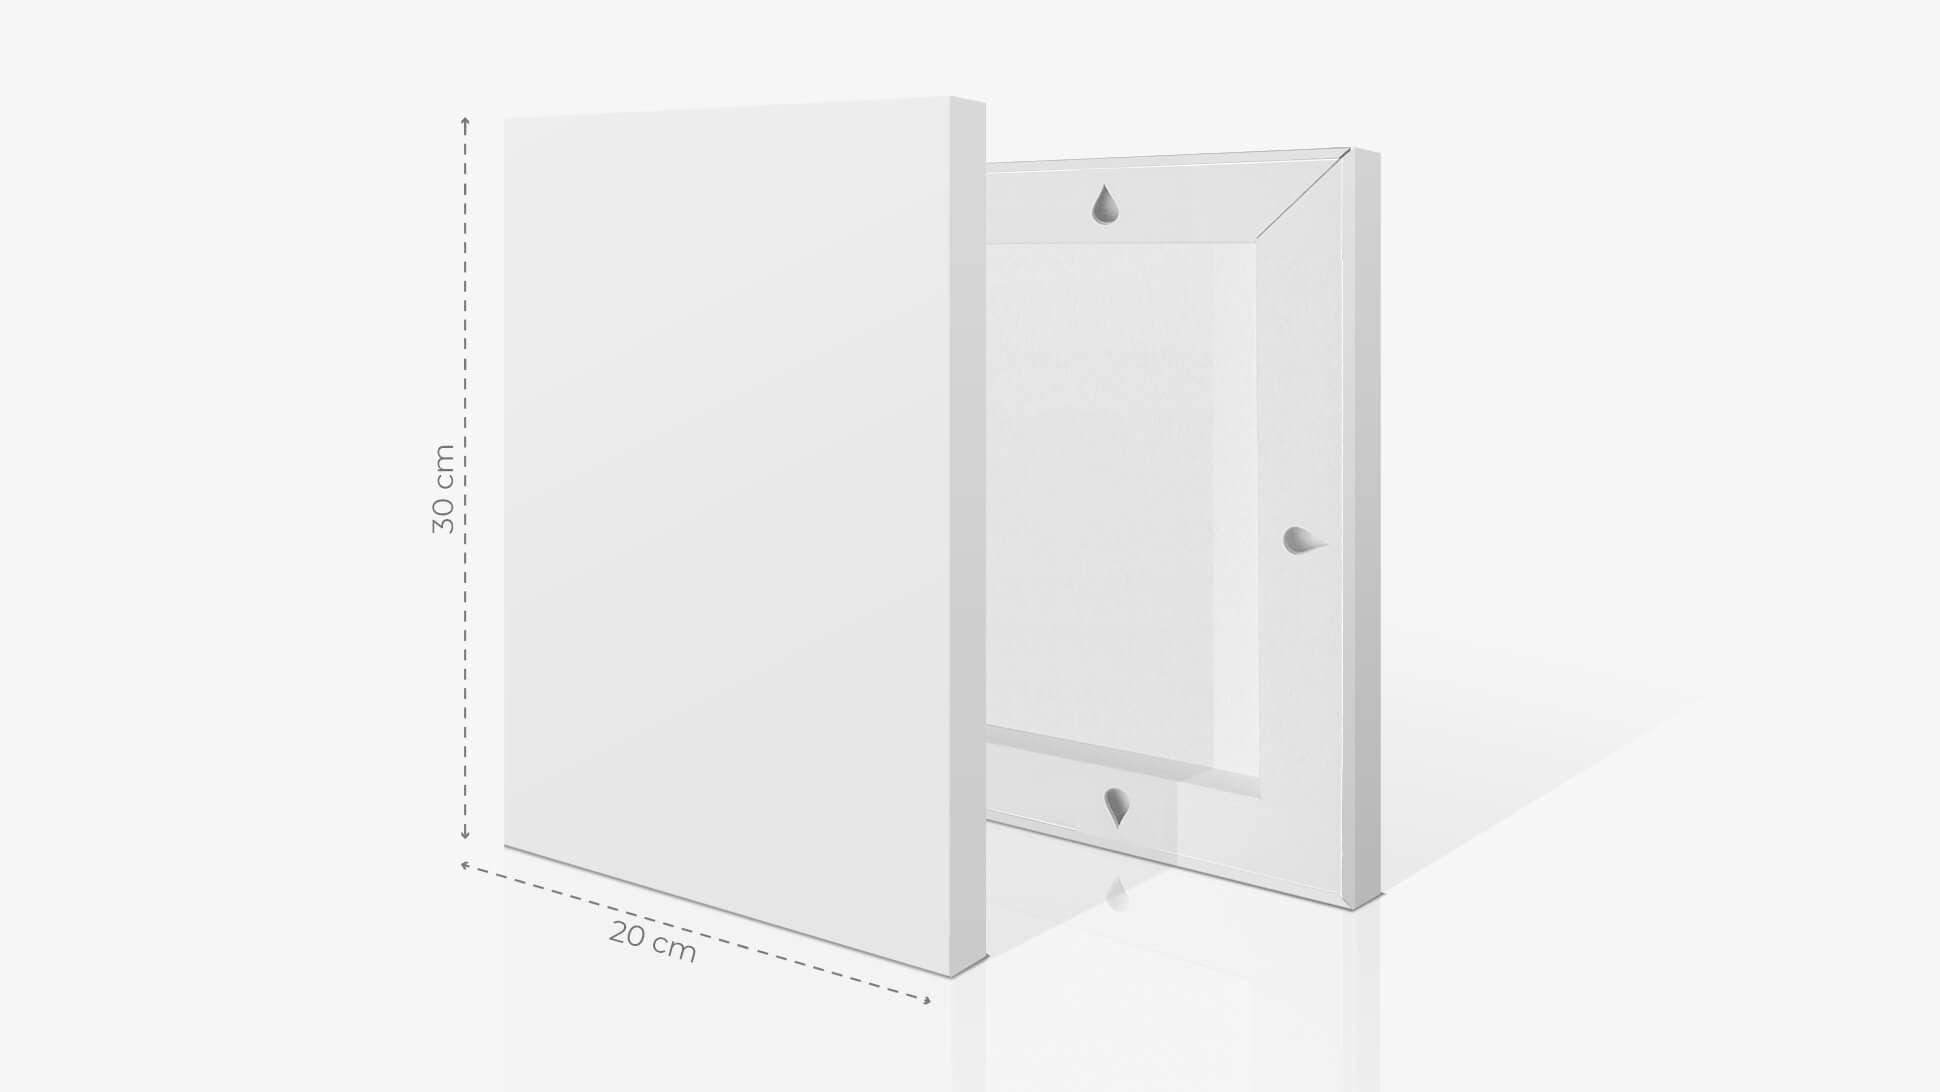 Fotoquadro 20x30 cm | tictac.it